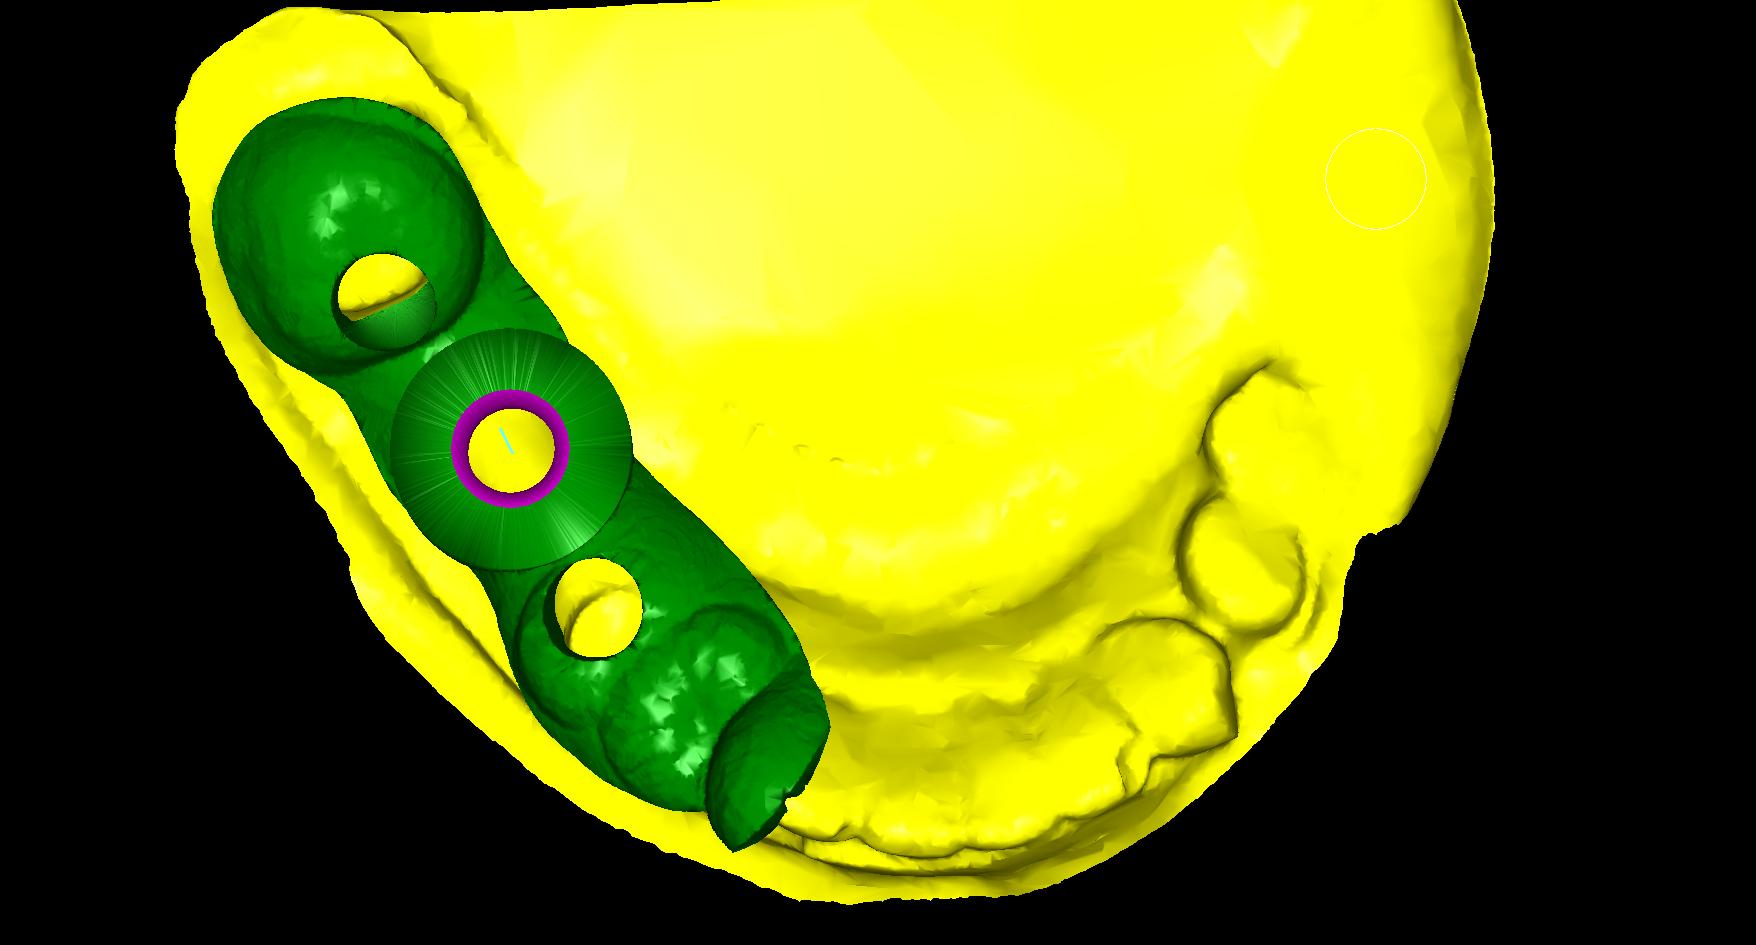 Implantátum 2